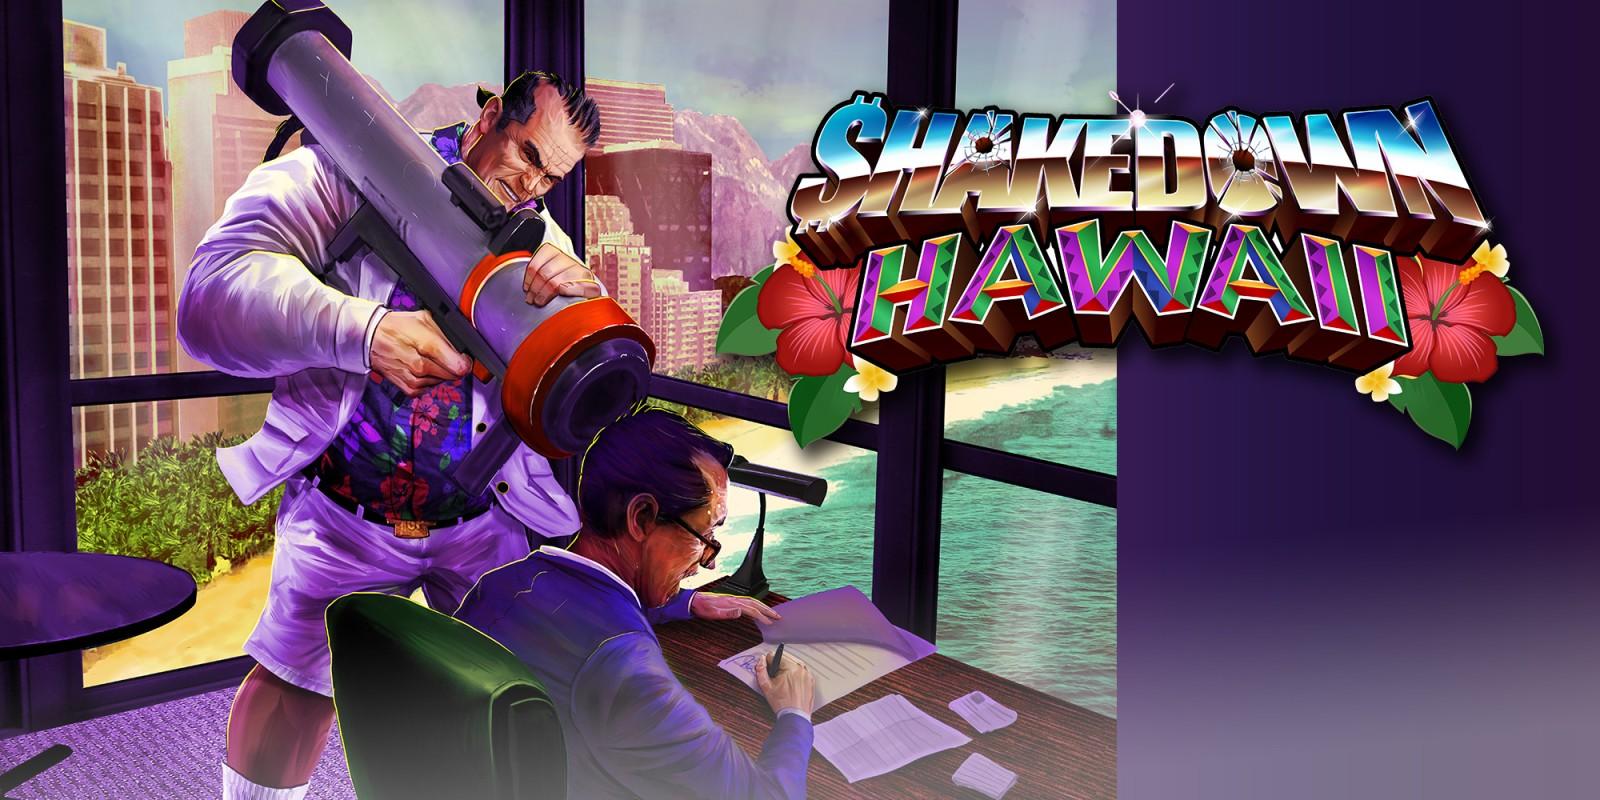 Shakedown: Hawaii, versione fisica per Nintendo Switch e digitale per Nintendo 3DS